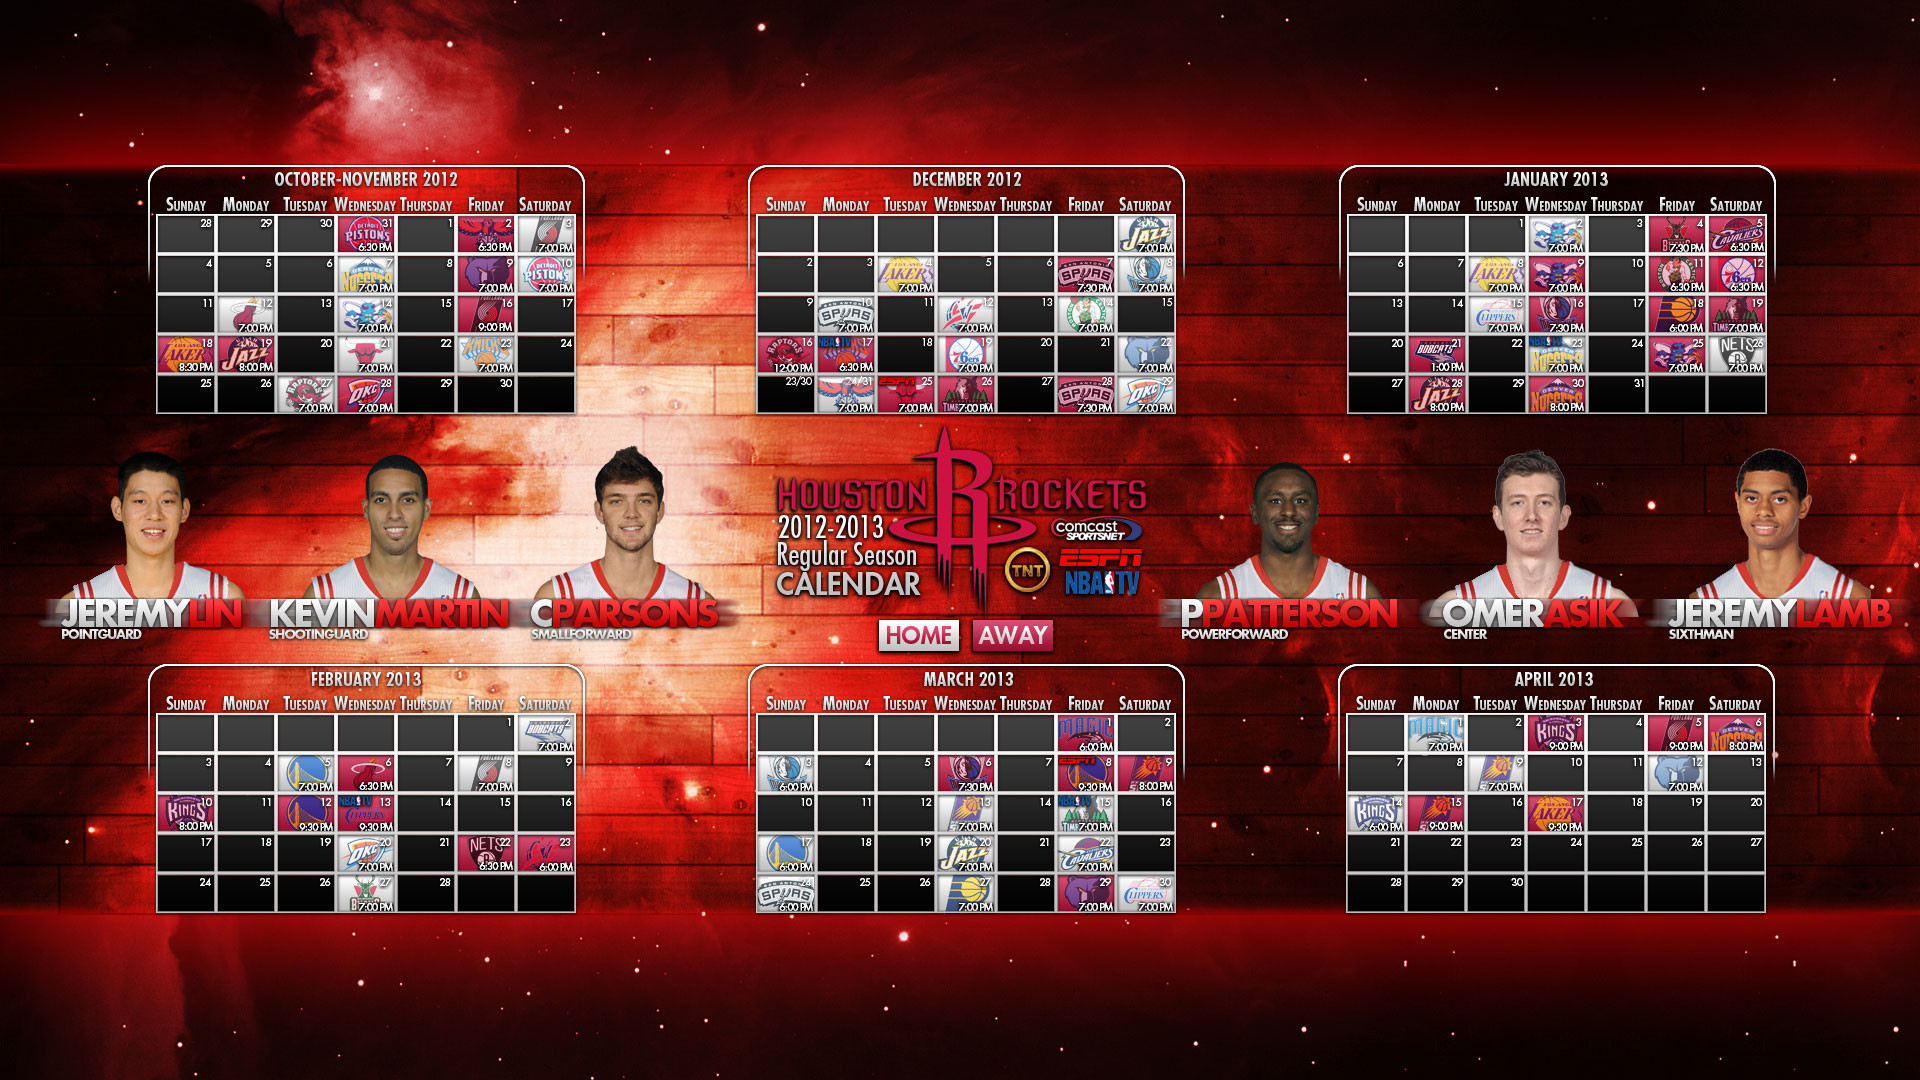 Houston Rockets 2012-2013 Schedule Wallpaper